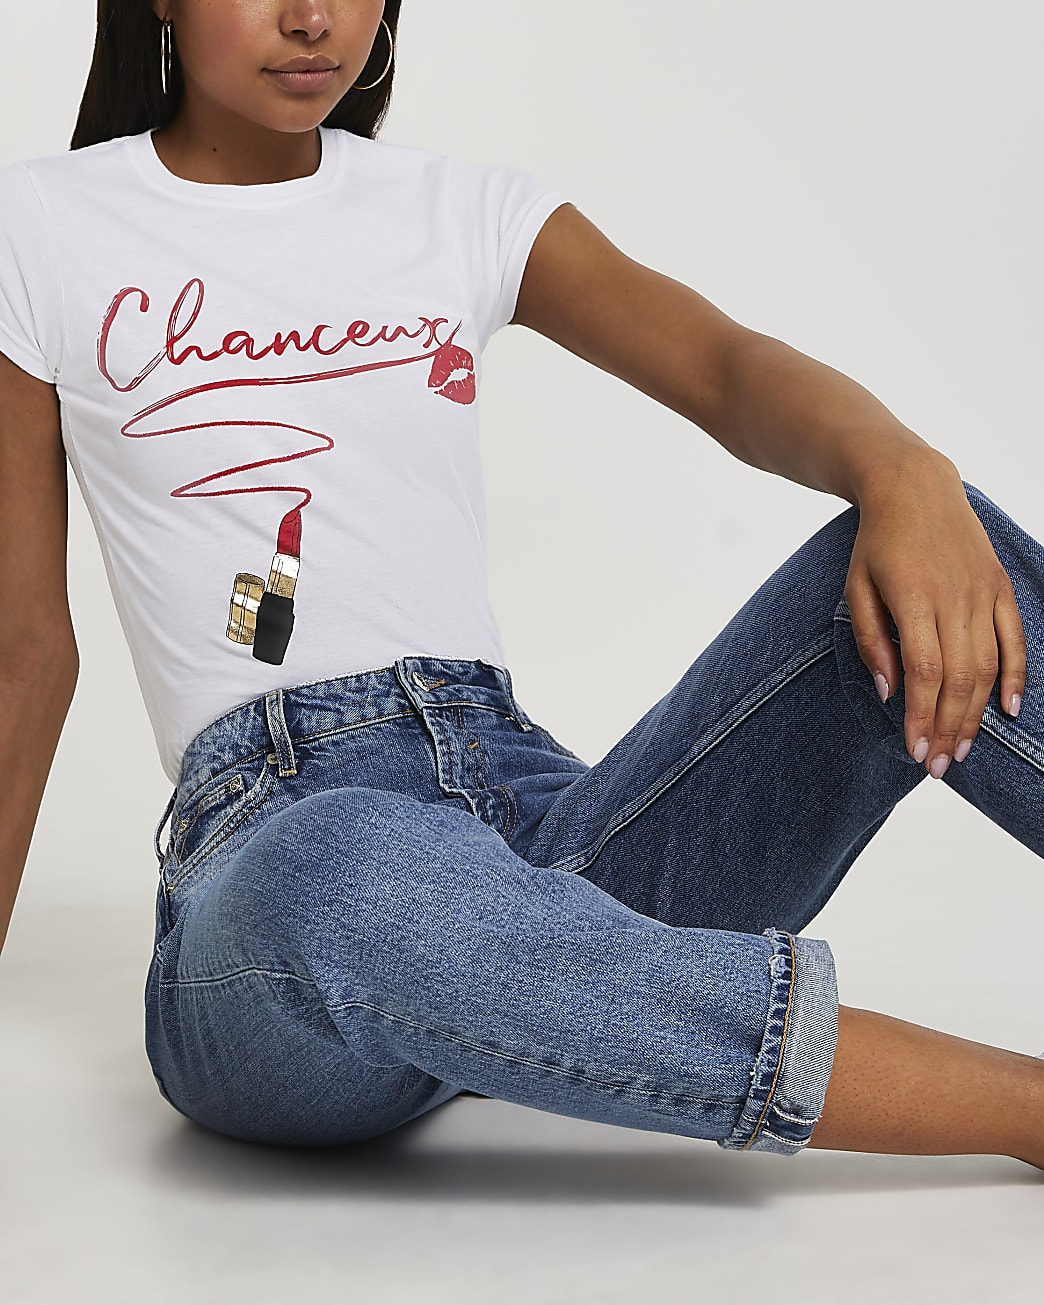 White short sleeve 'Chanceux' t-shirt